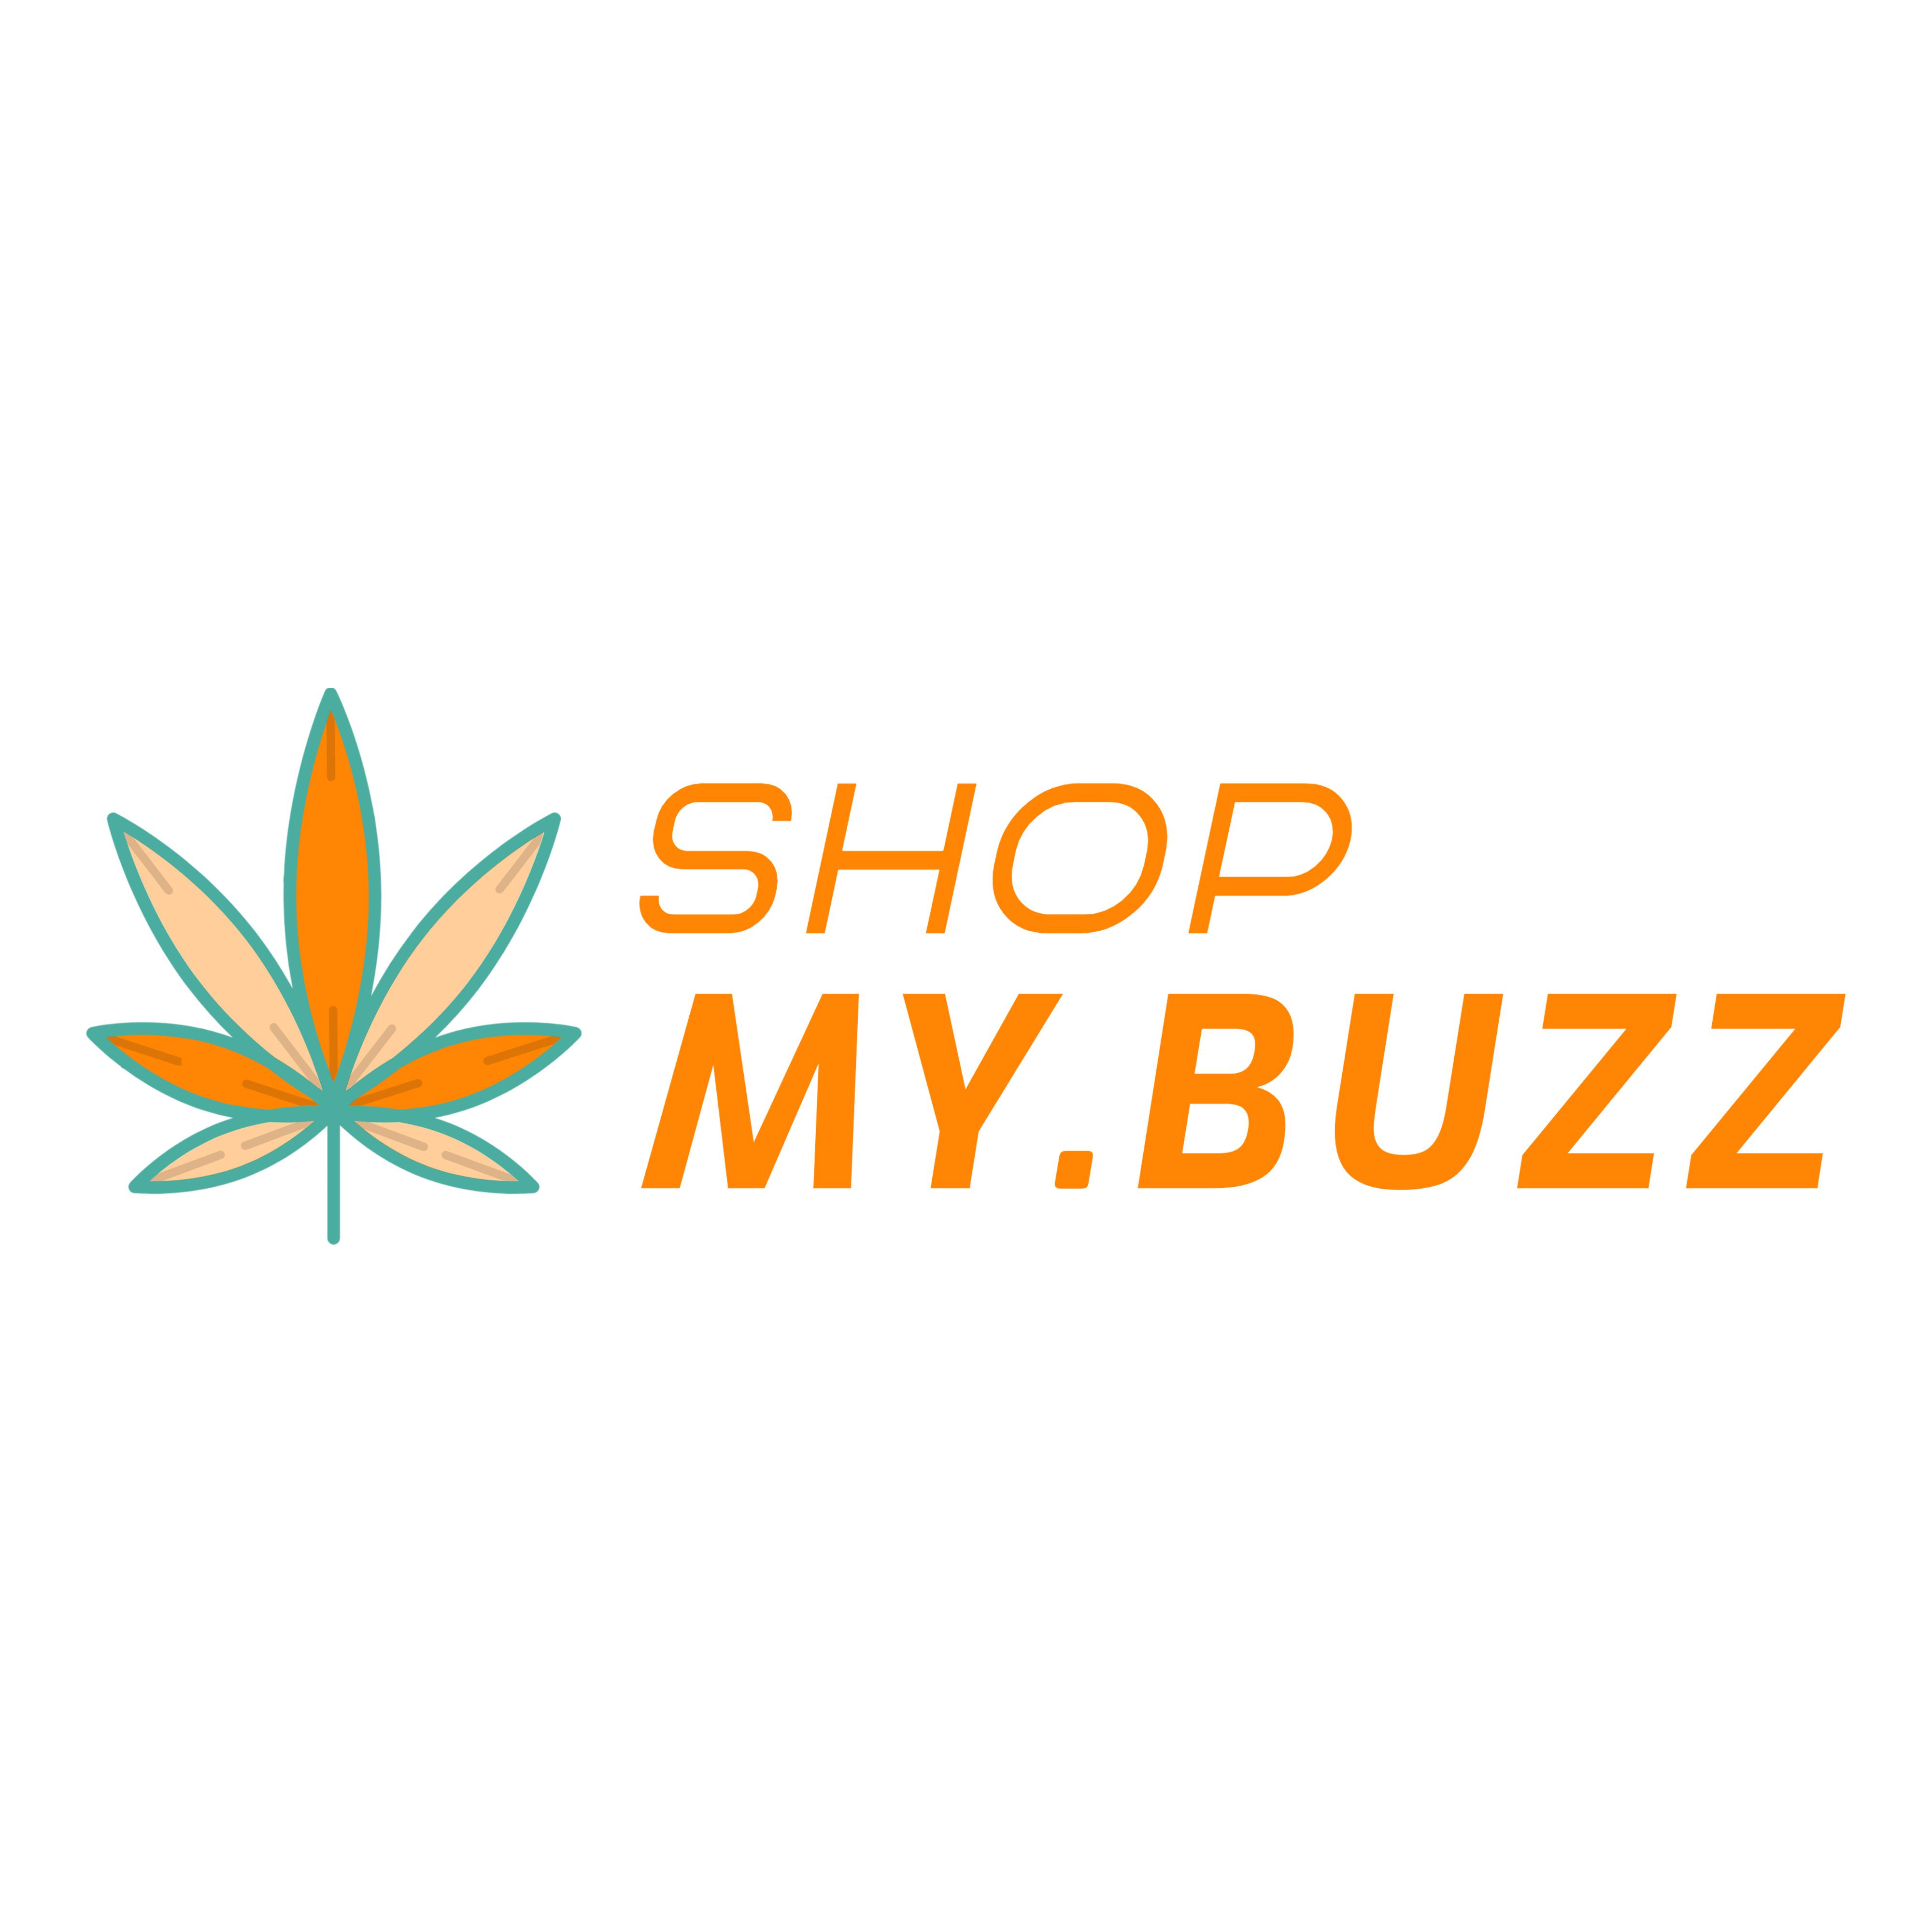 SHOP MY BUZZ | ONLINE DISPENSARY MAIL ORDER MARIJUANA IN CANADA